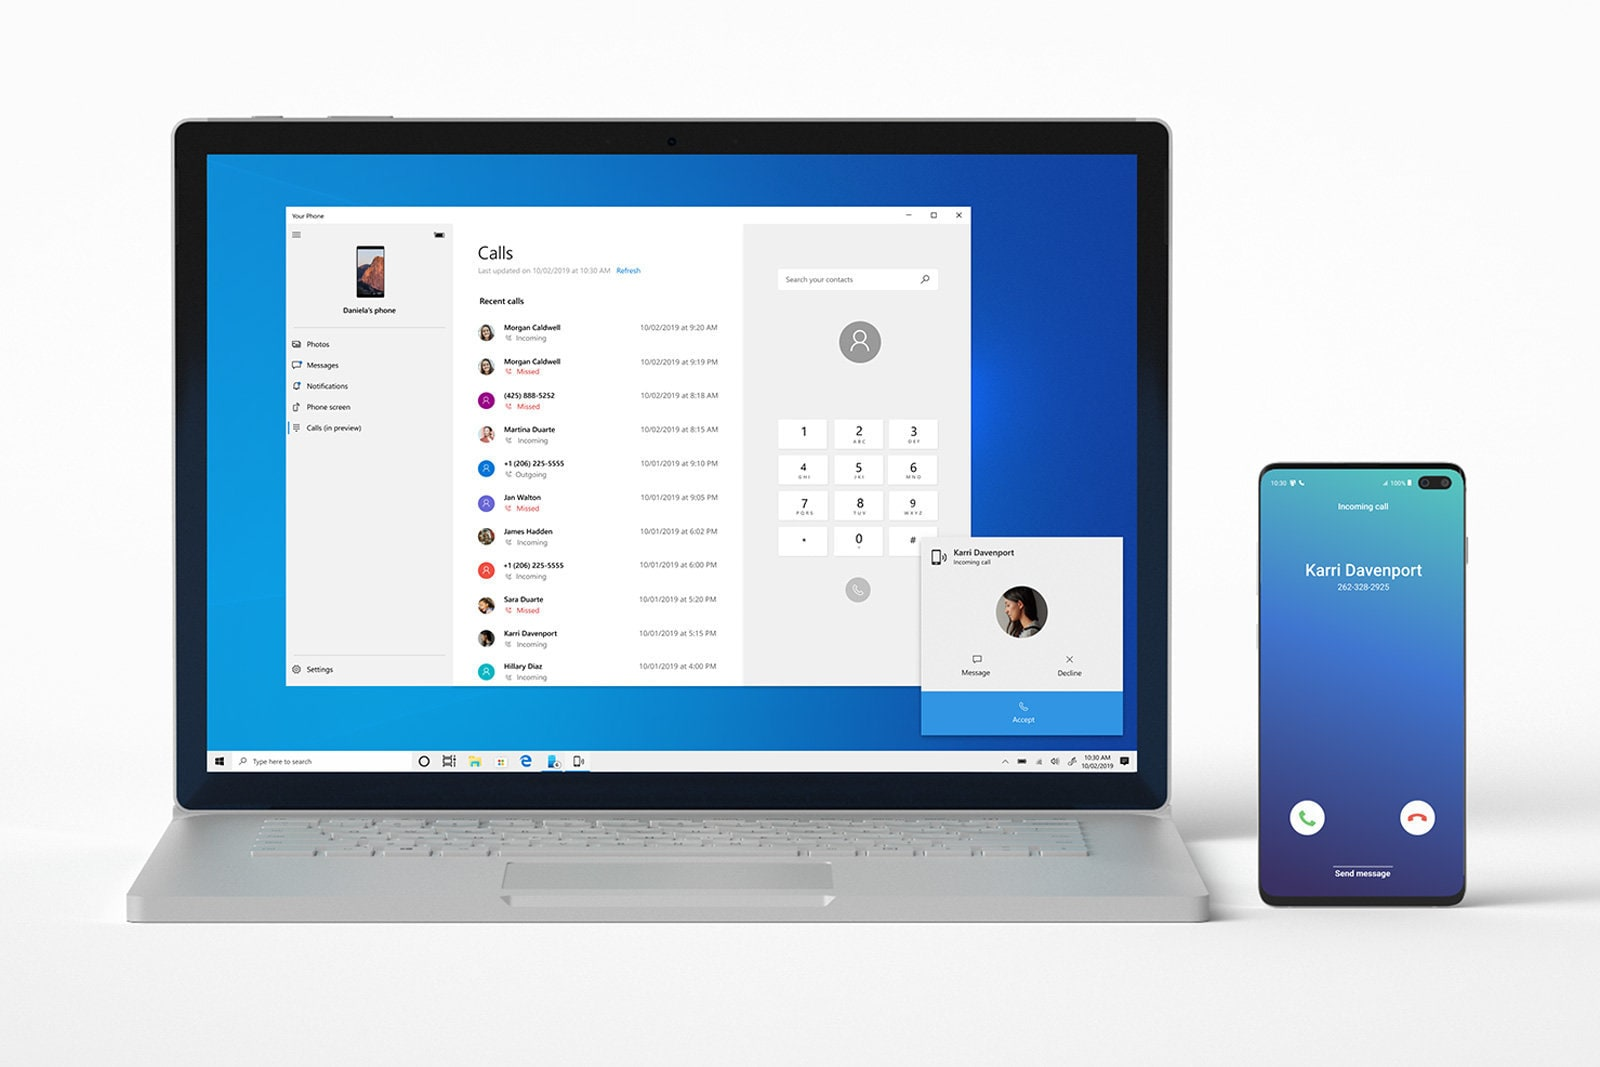 Windows 10 Your Phone Call